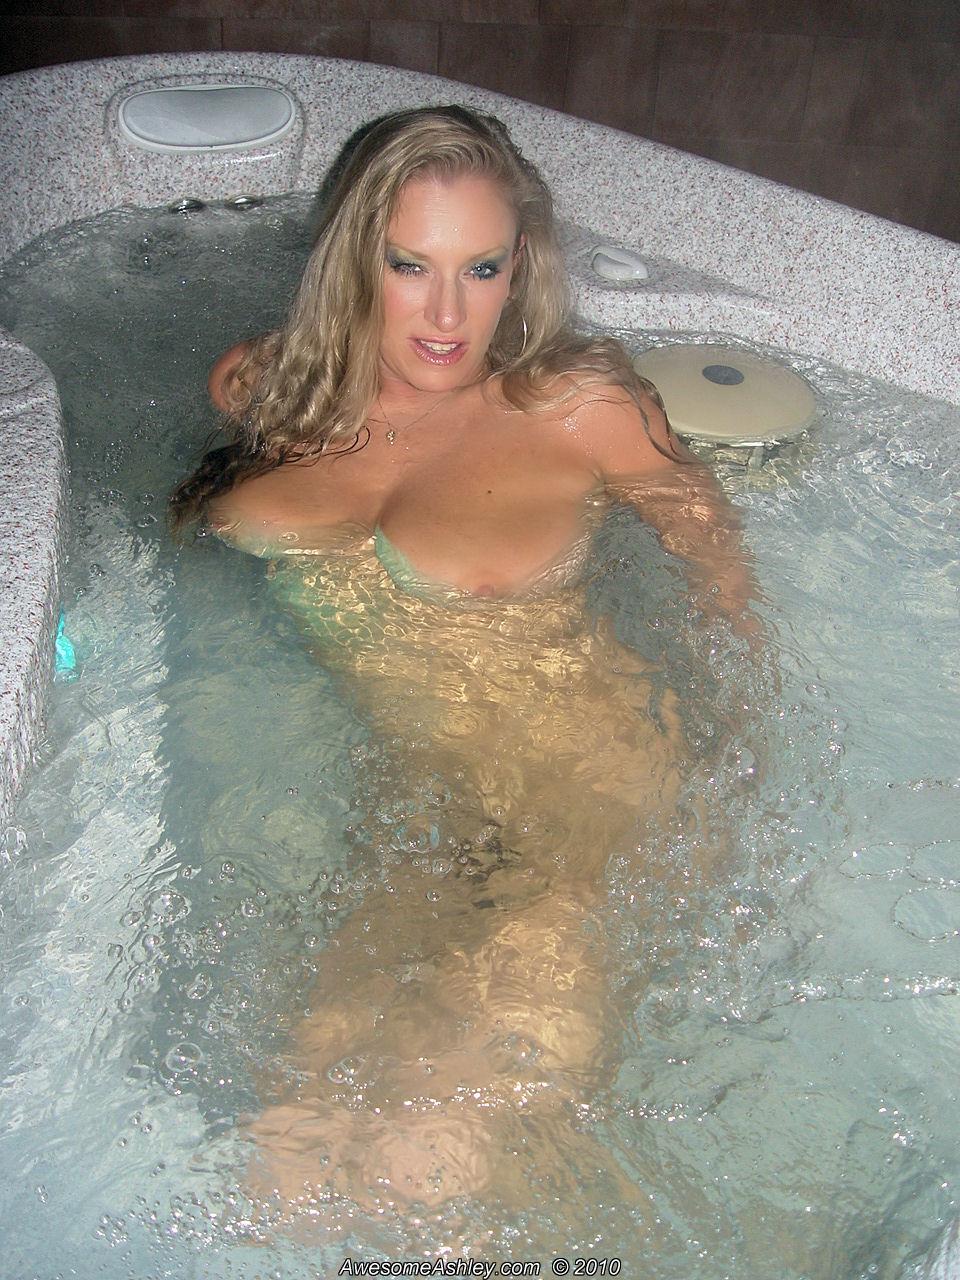 Awesome Ashley Porn Pics awesomeashley's homepage on myfreecams